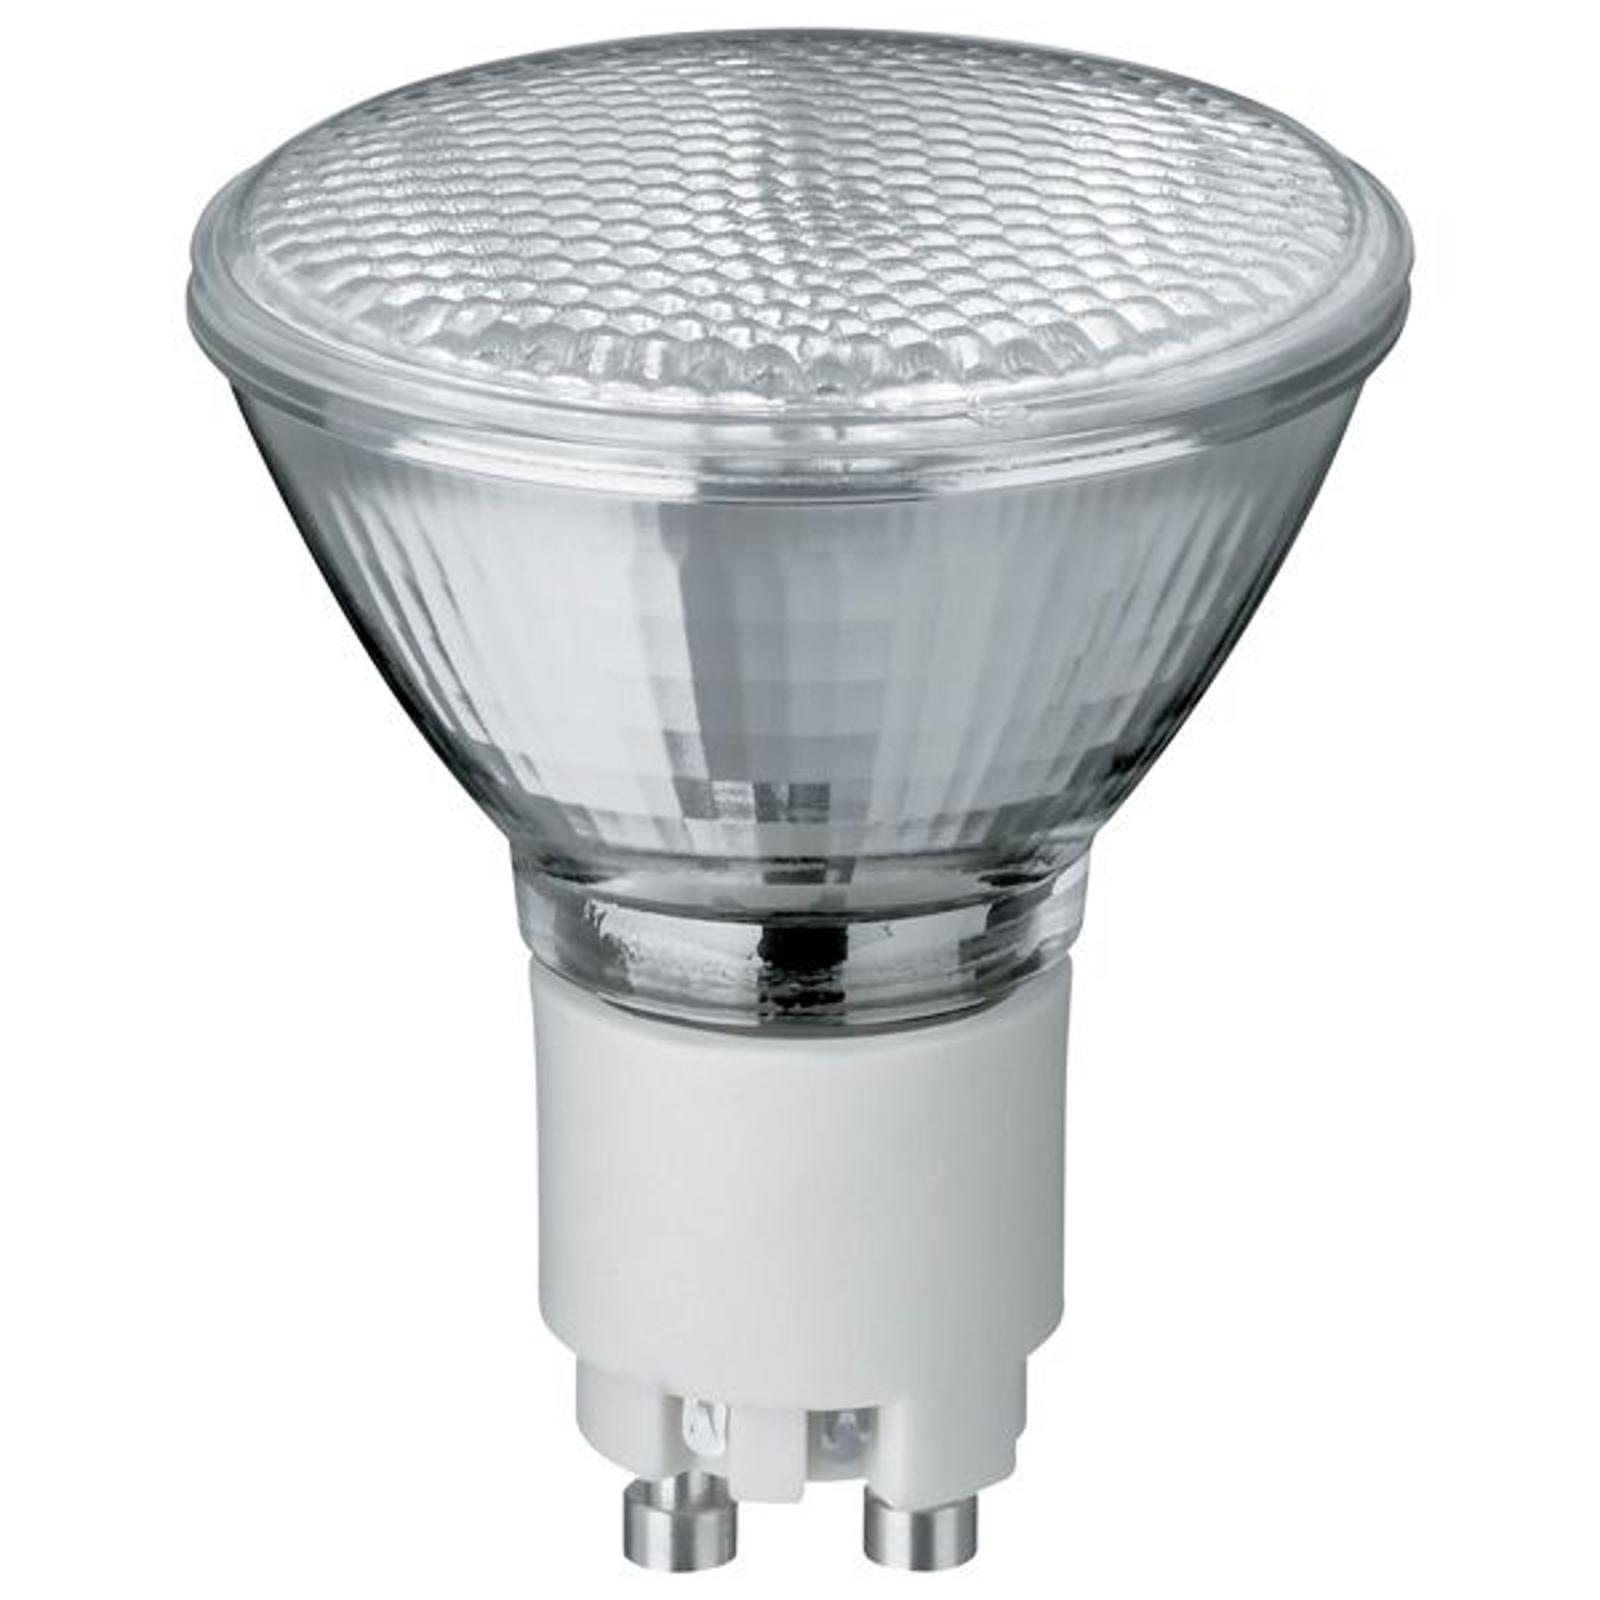 GX10 20W 40° Entladungslampe Mastercolor CDM-R